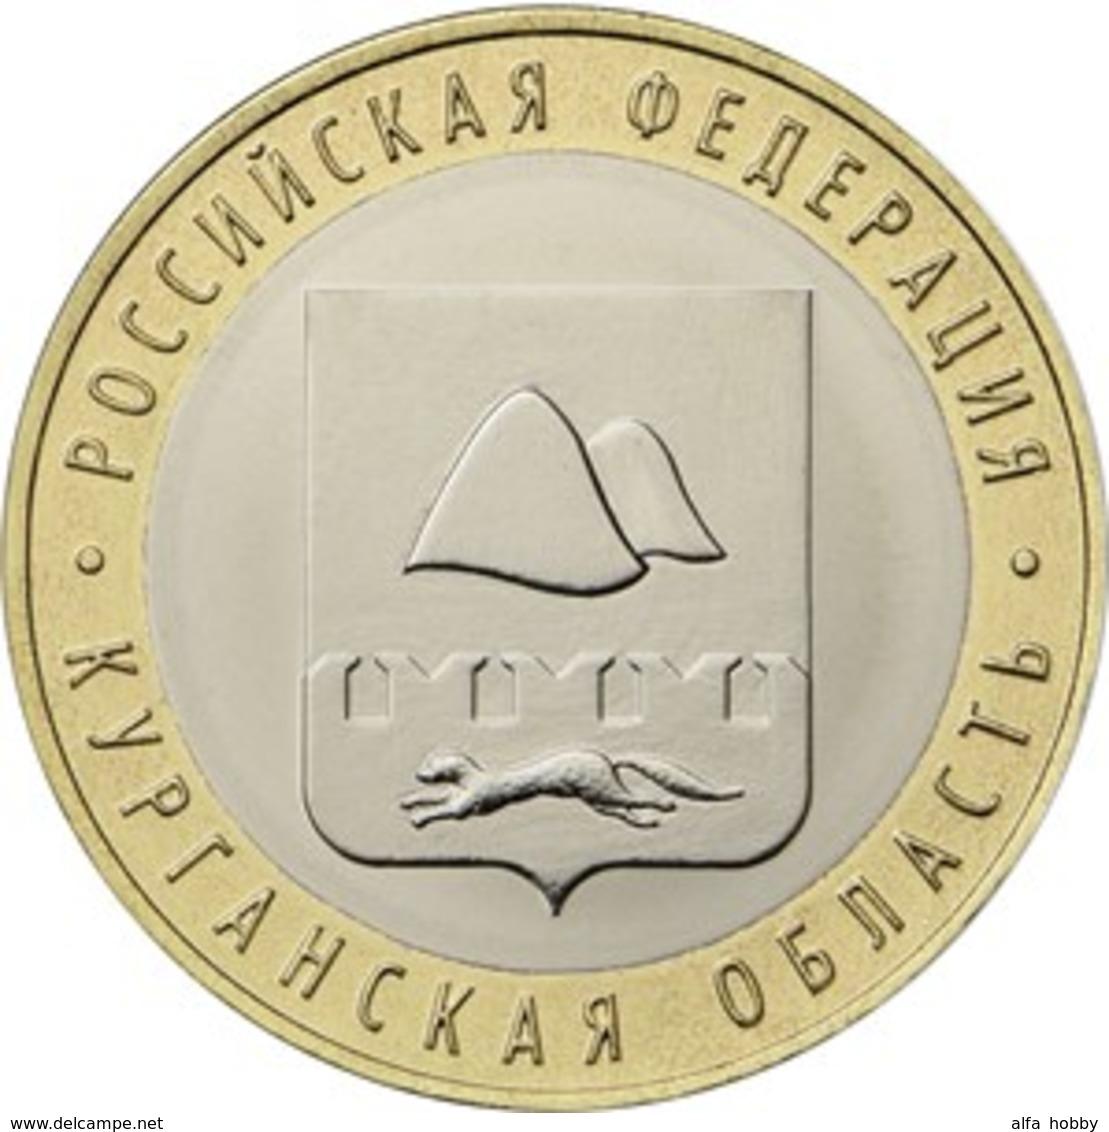 Russia, Kurgan Region, 2018, 10 Rbl Rubels Rubles Bi-metallic Uncirculated - Russland